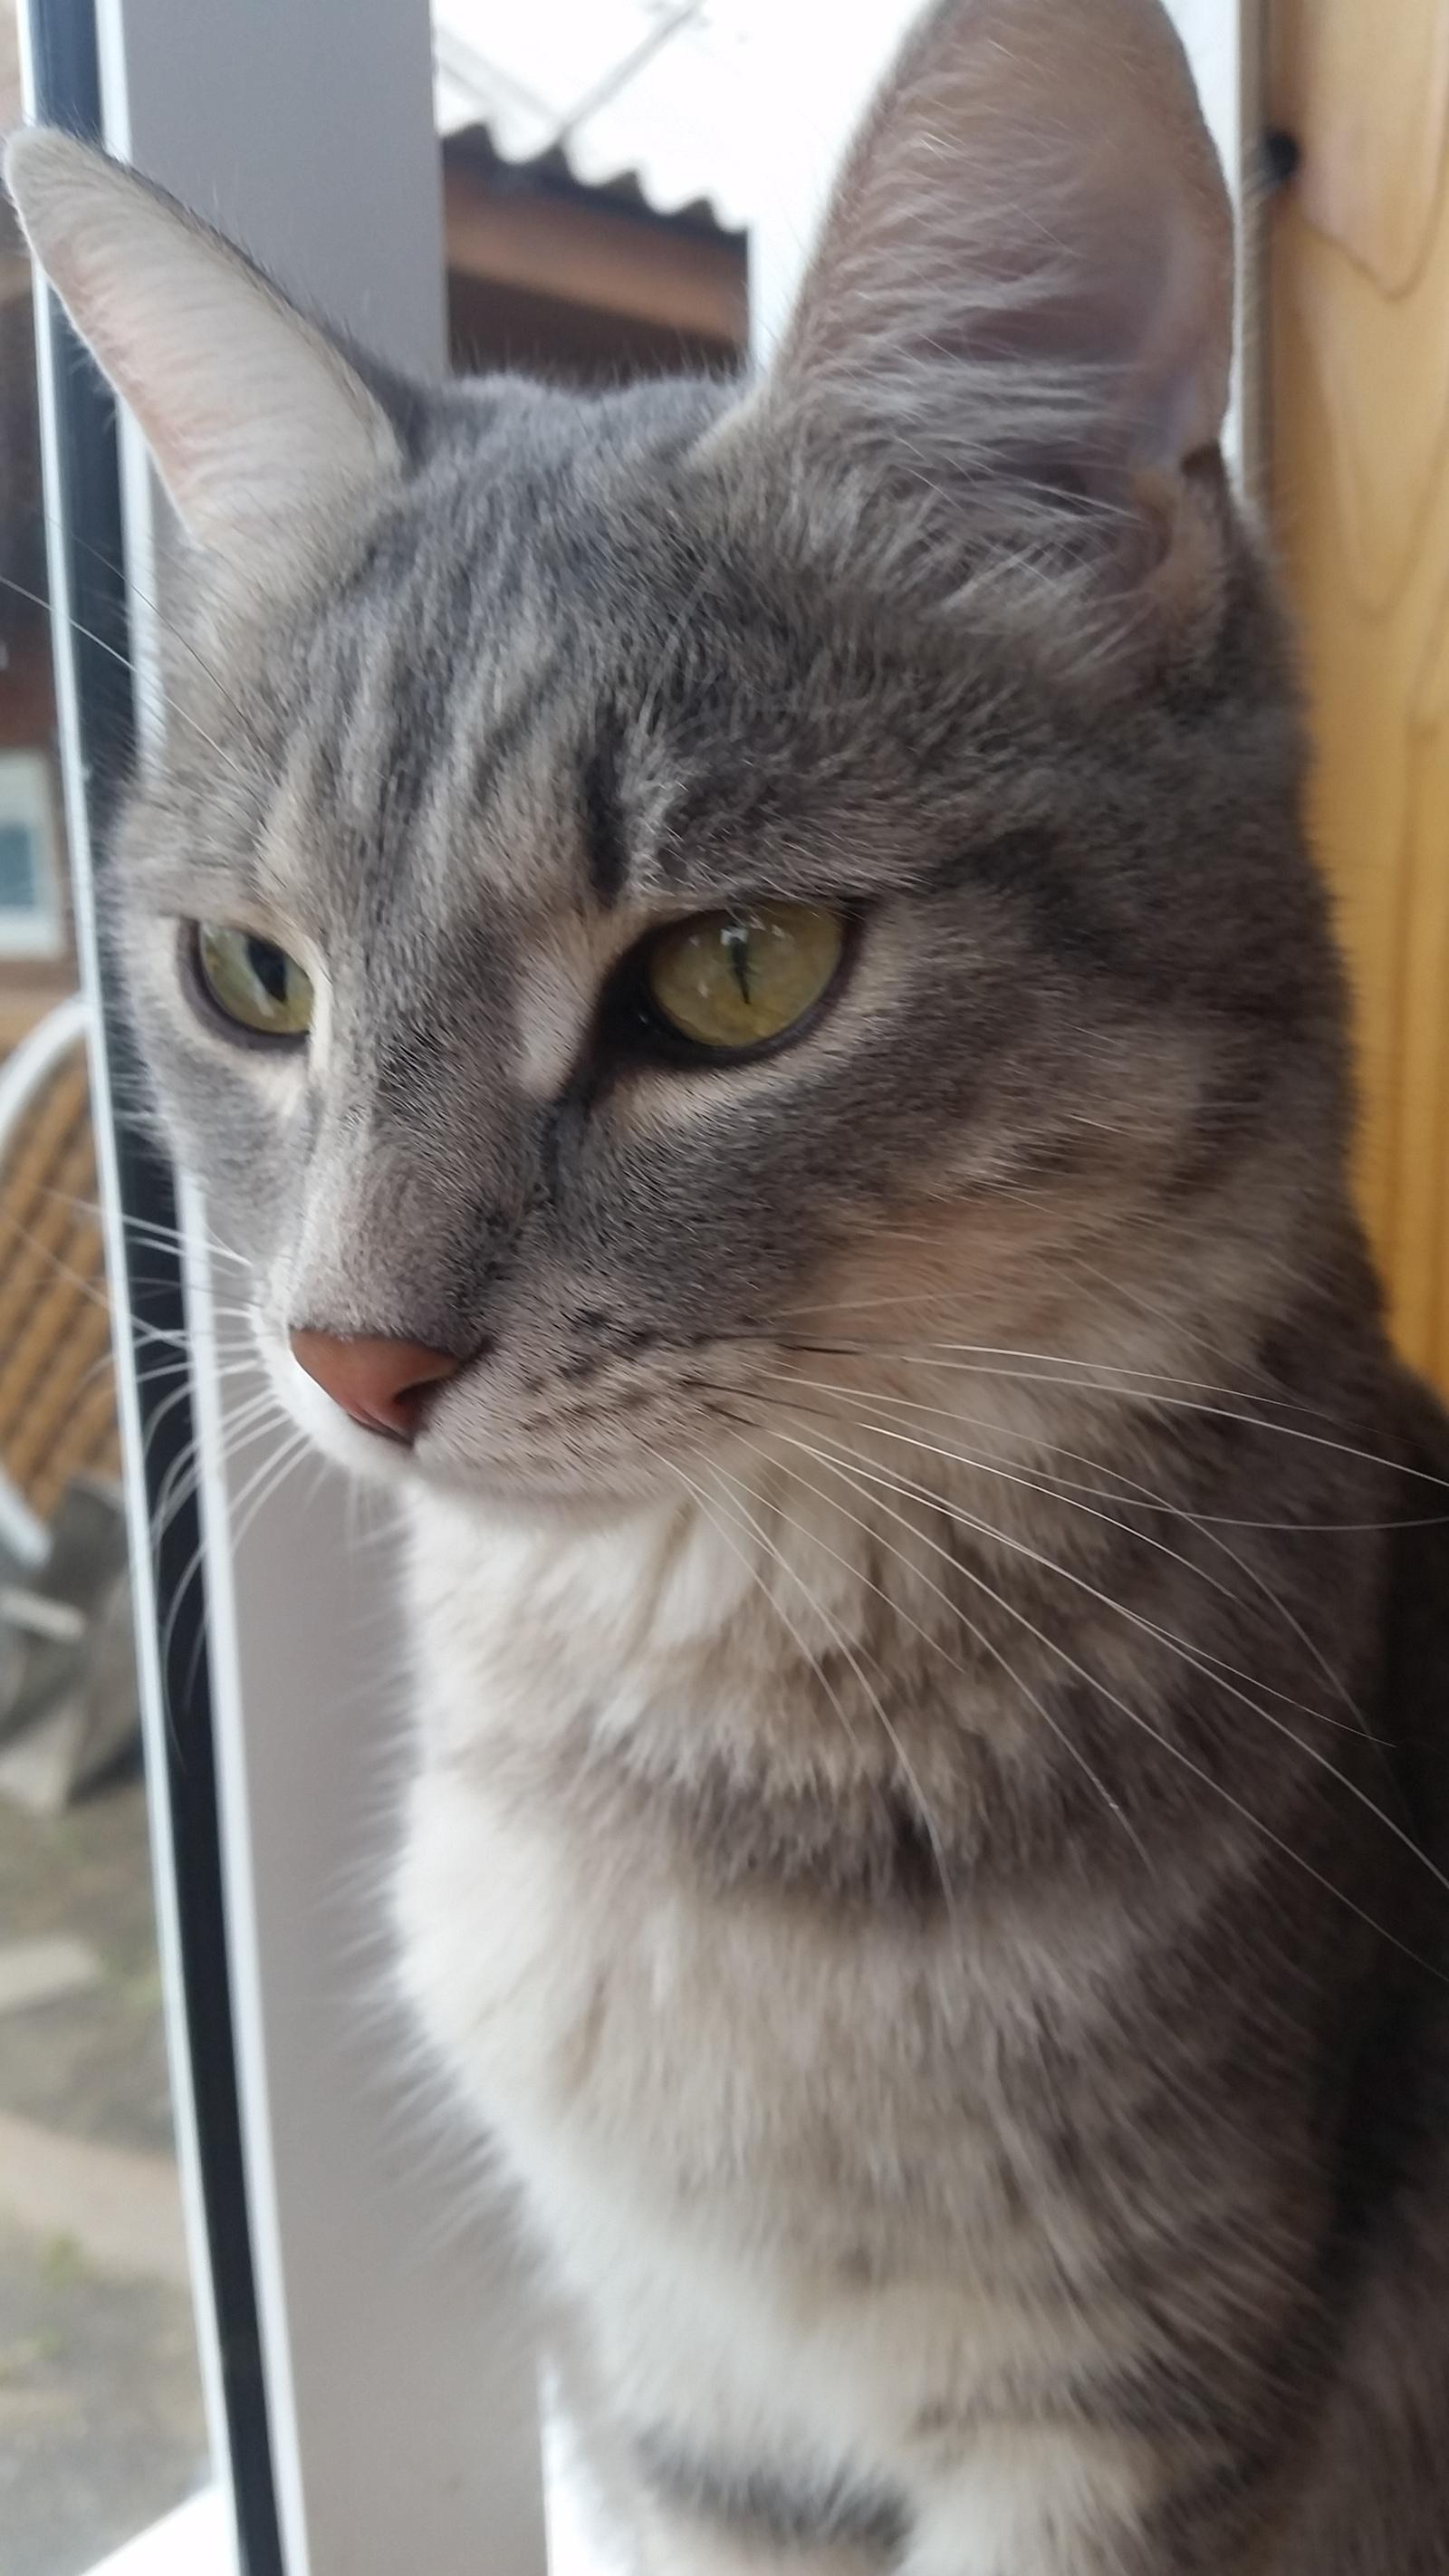 Почему у кота разного размера зрачки